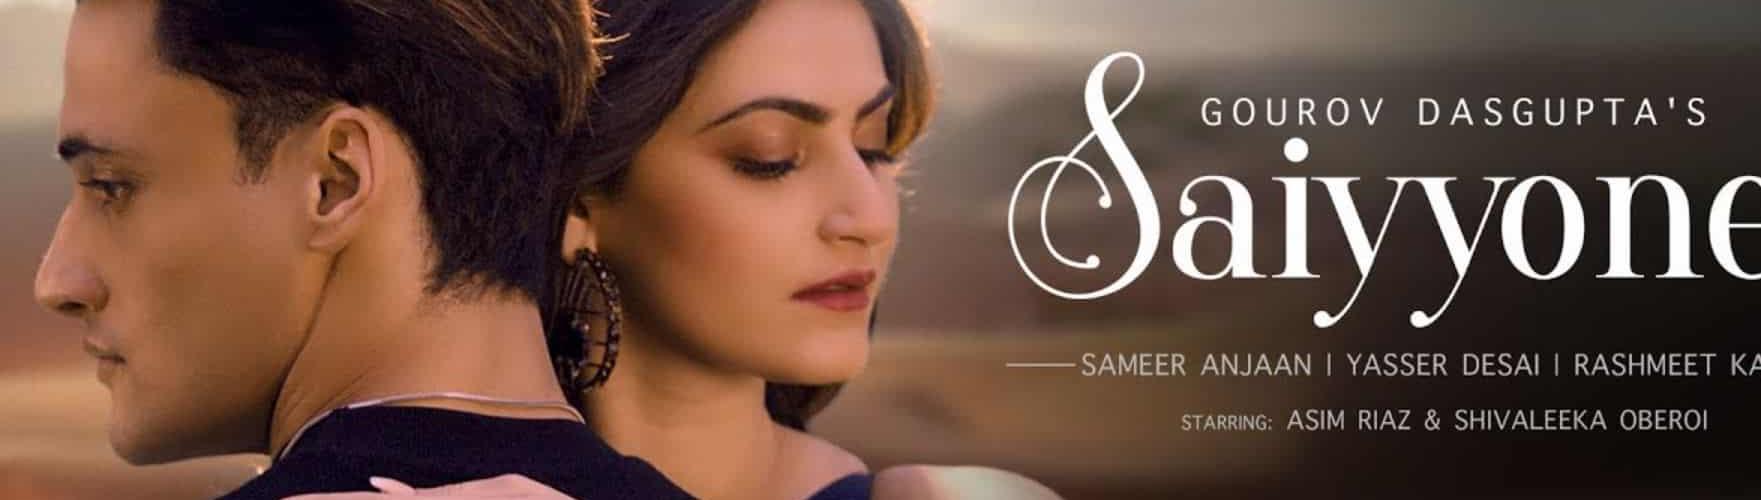 Saiyyonee Song Asim Riaz Yassir Desai Download Whatsapp Status Video